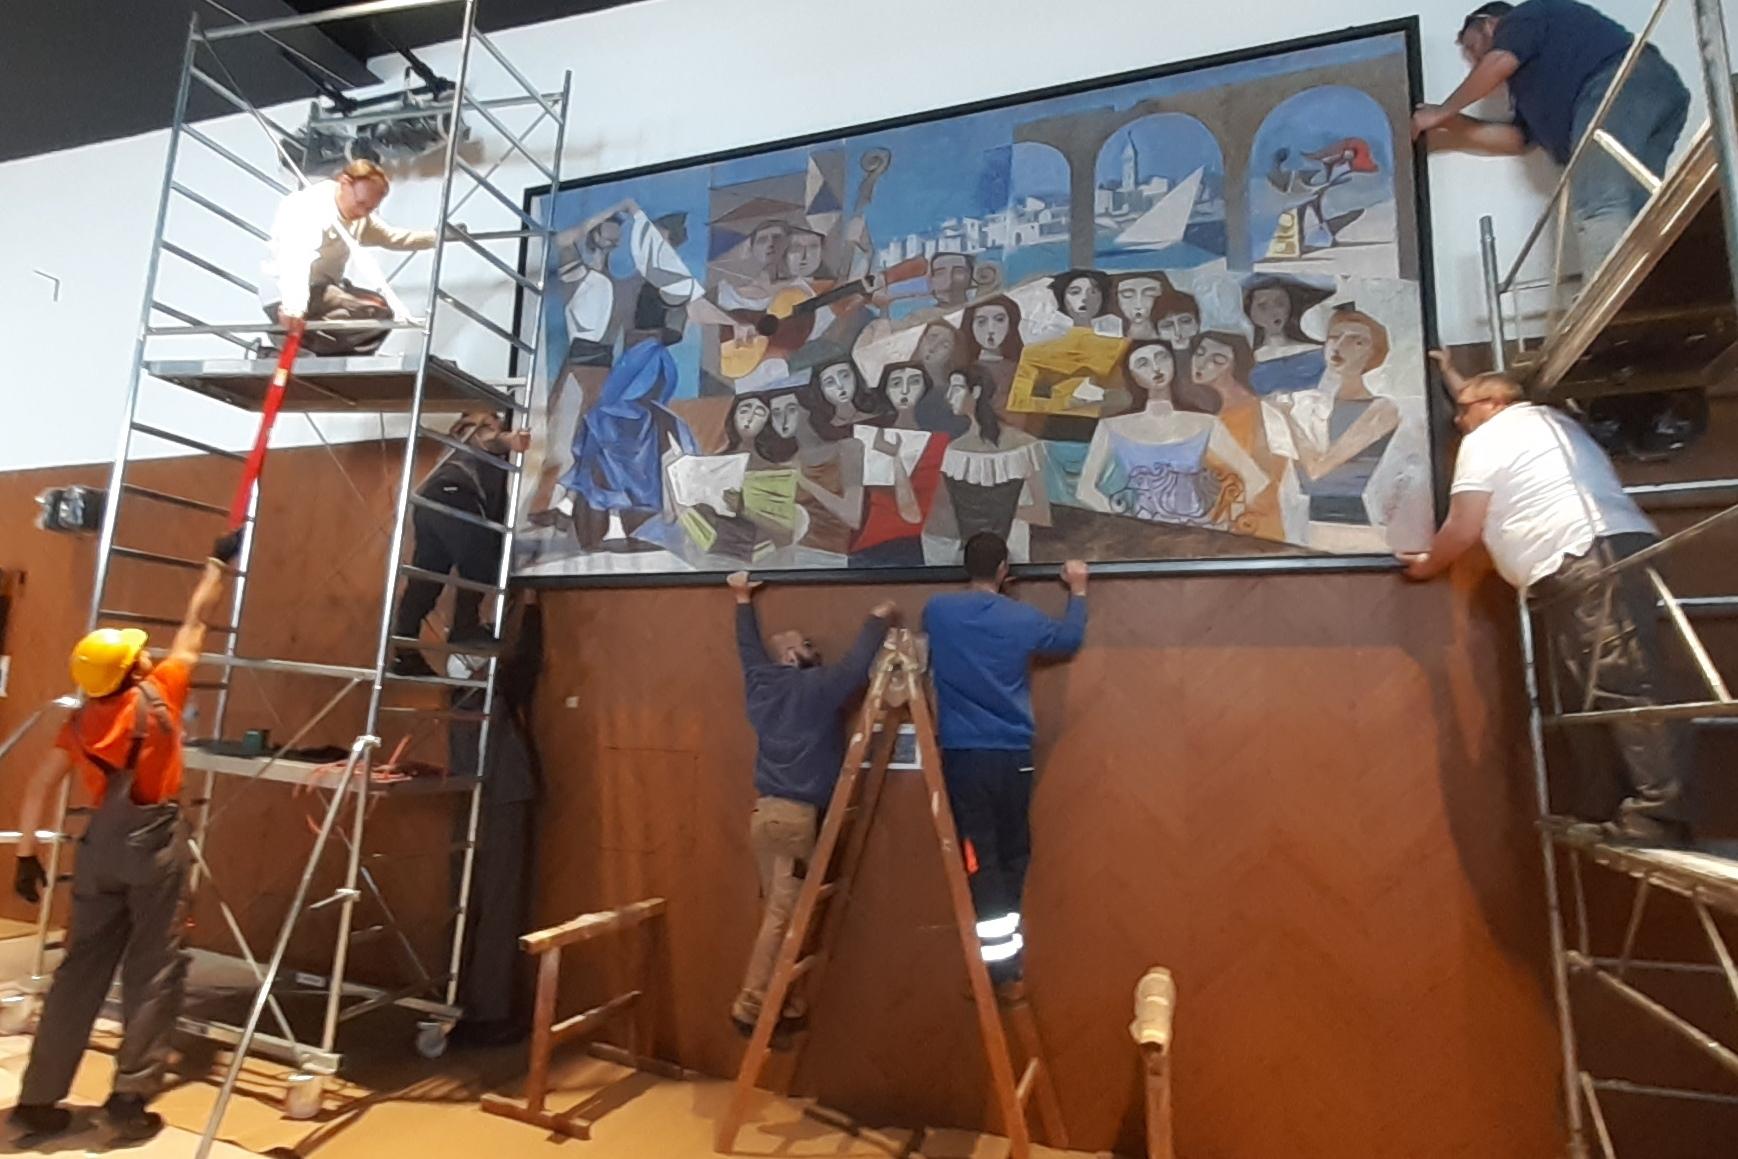 http://www.novigrad.hr/chetiri_velika_mascarellijeva_platna_nakon_restauracije_vraena_u_kinodvoran